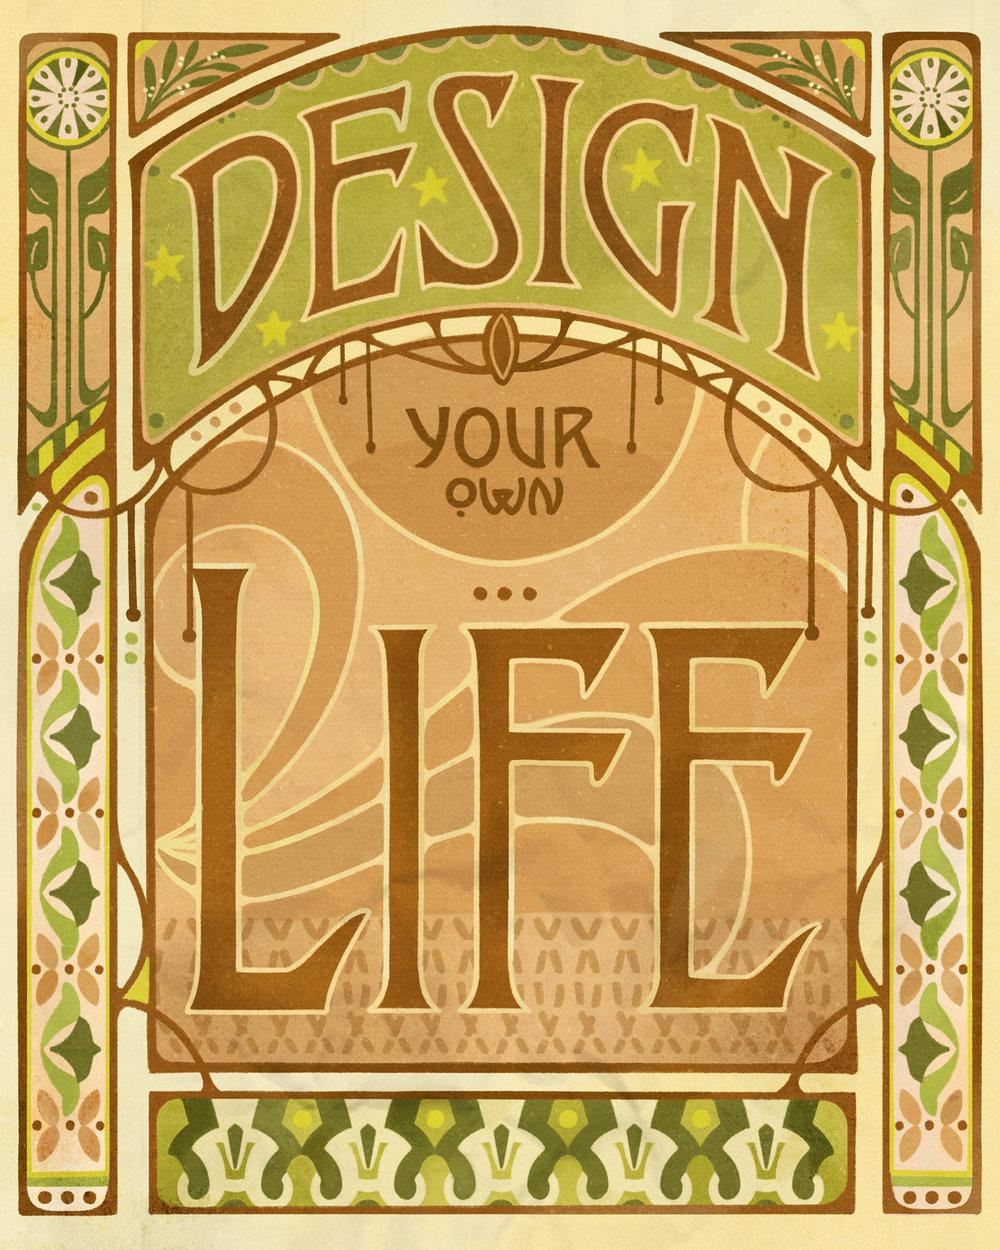 DesignYourOwnLife.jpg